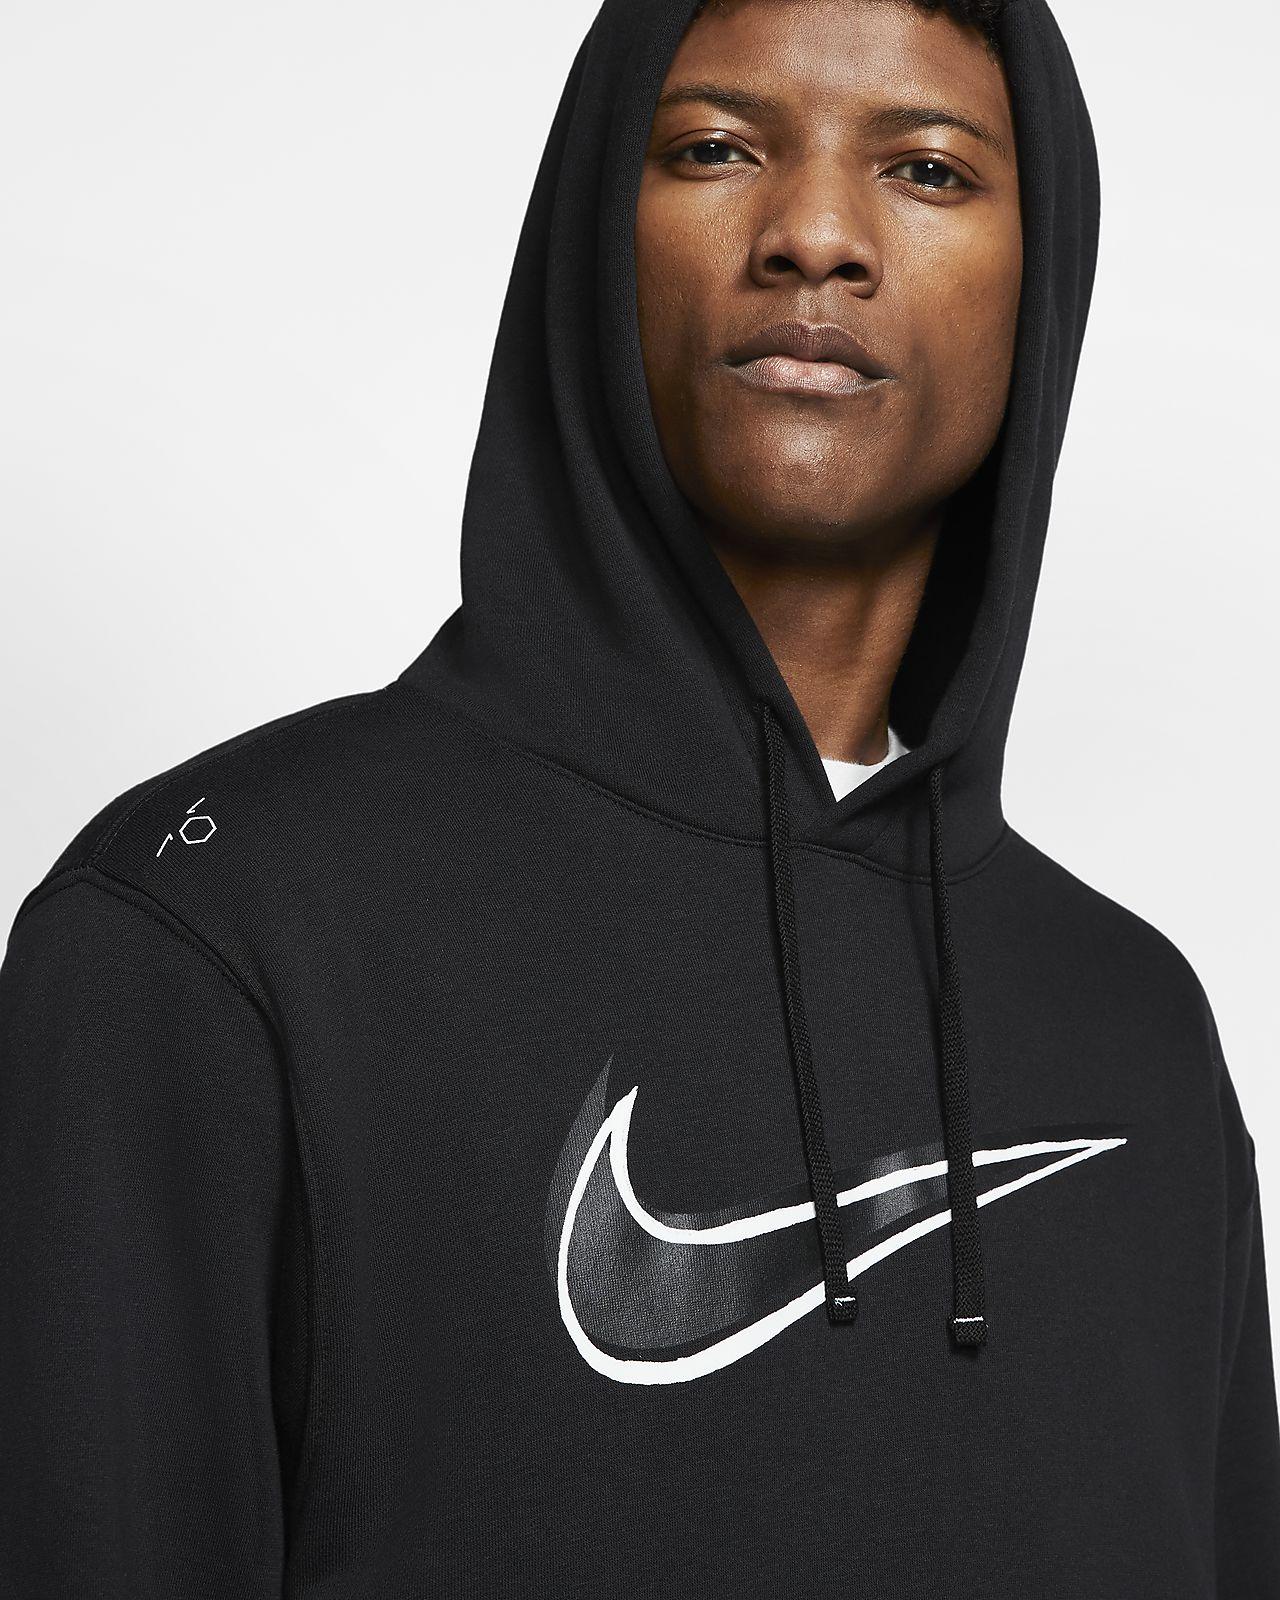 Nike Sweat pour à Sportswear capuche Homme Nnwmv0Oy8